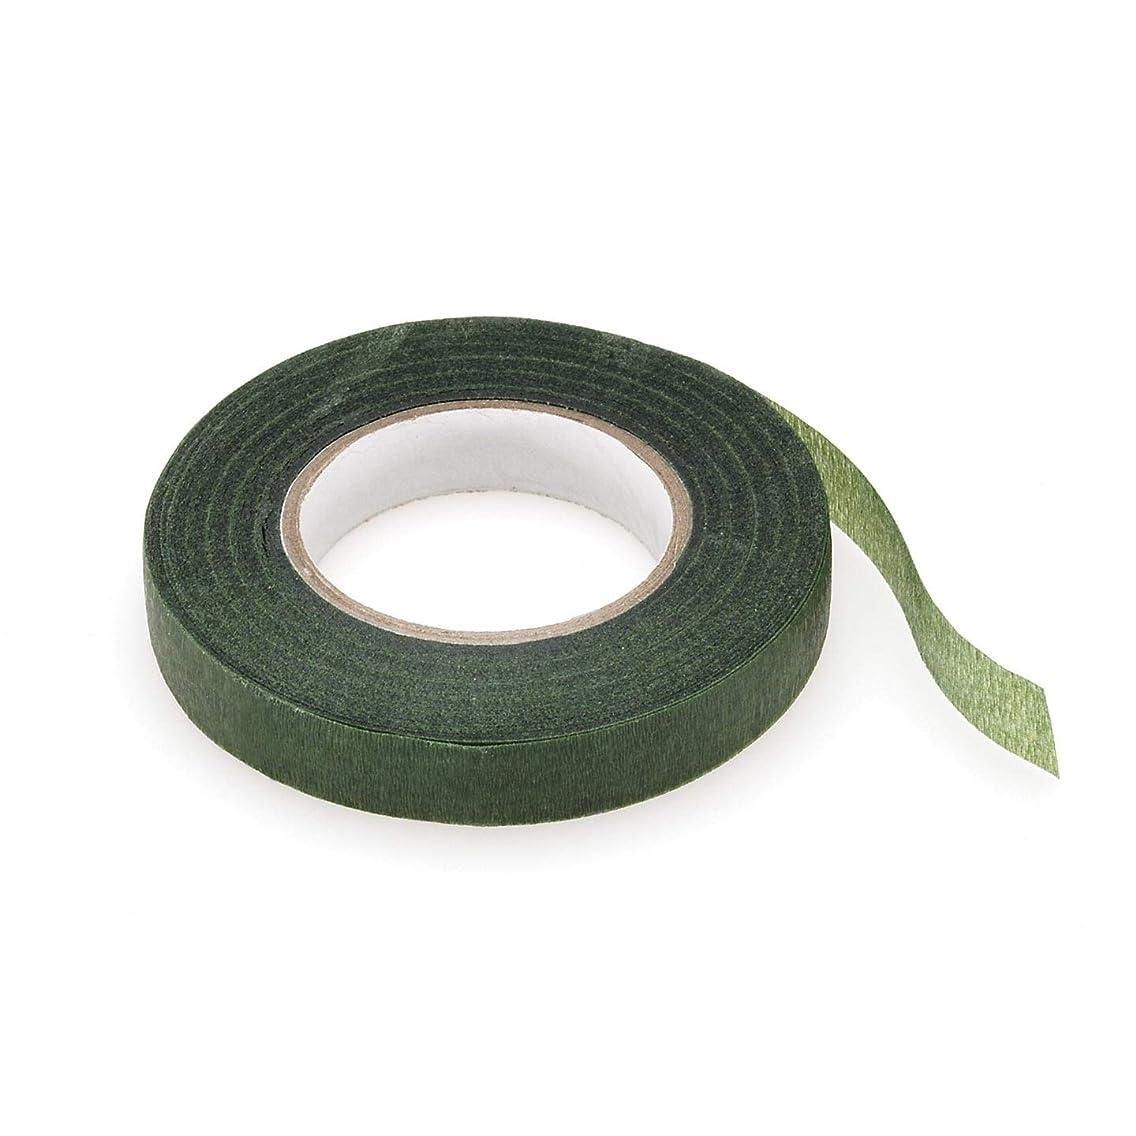 Bulk Buy: Darice DIY Crafts Floral Tape Green 1/2 inch x 30 yards (3-Pack) P35754-3